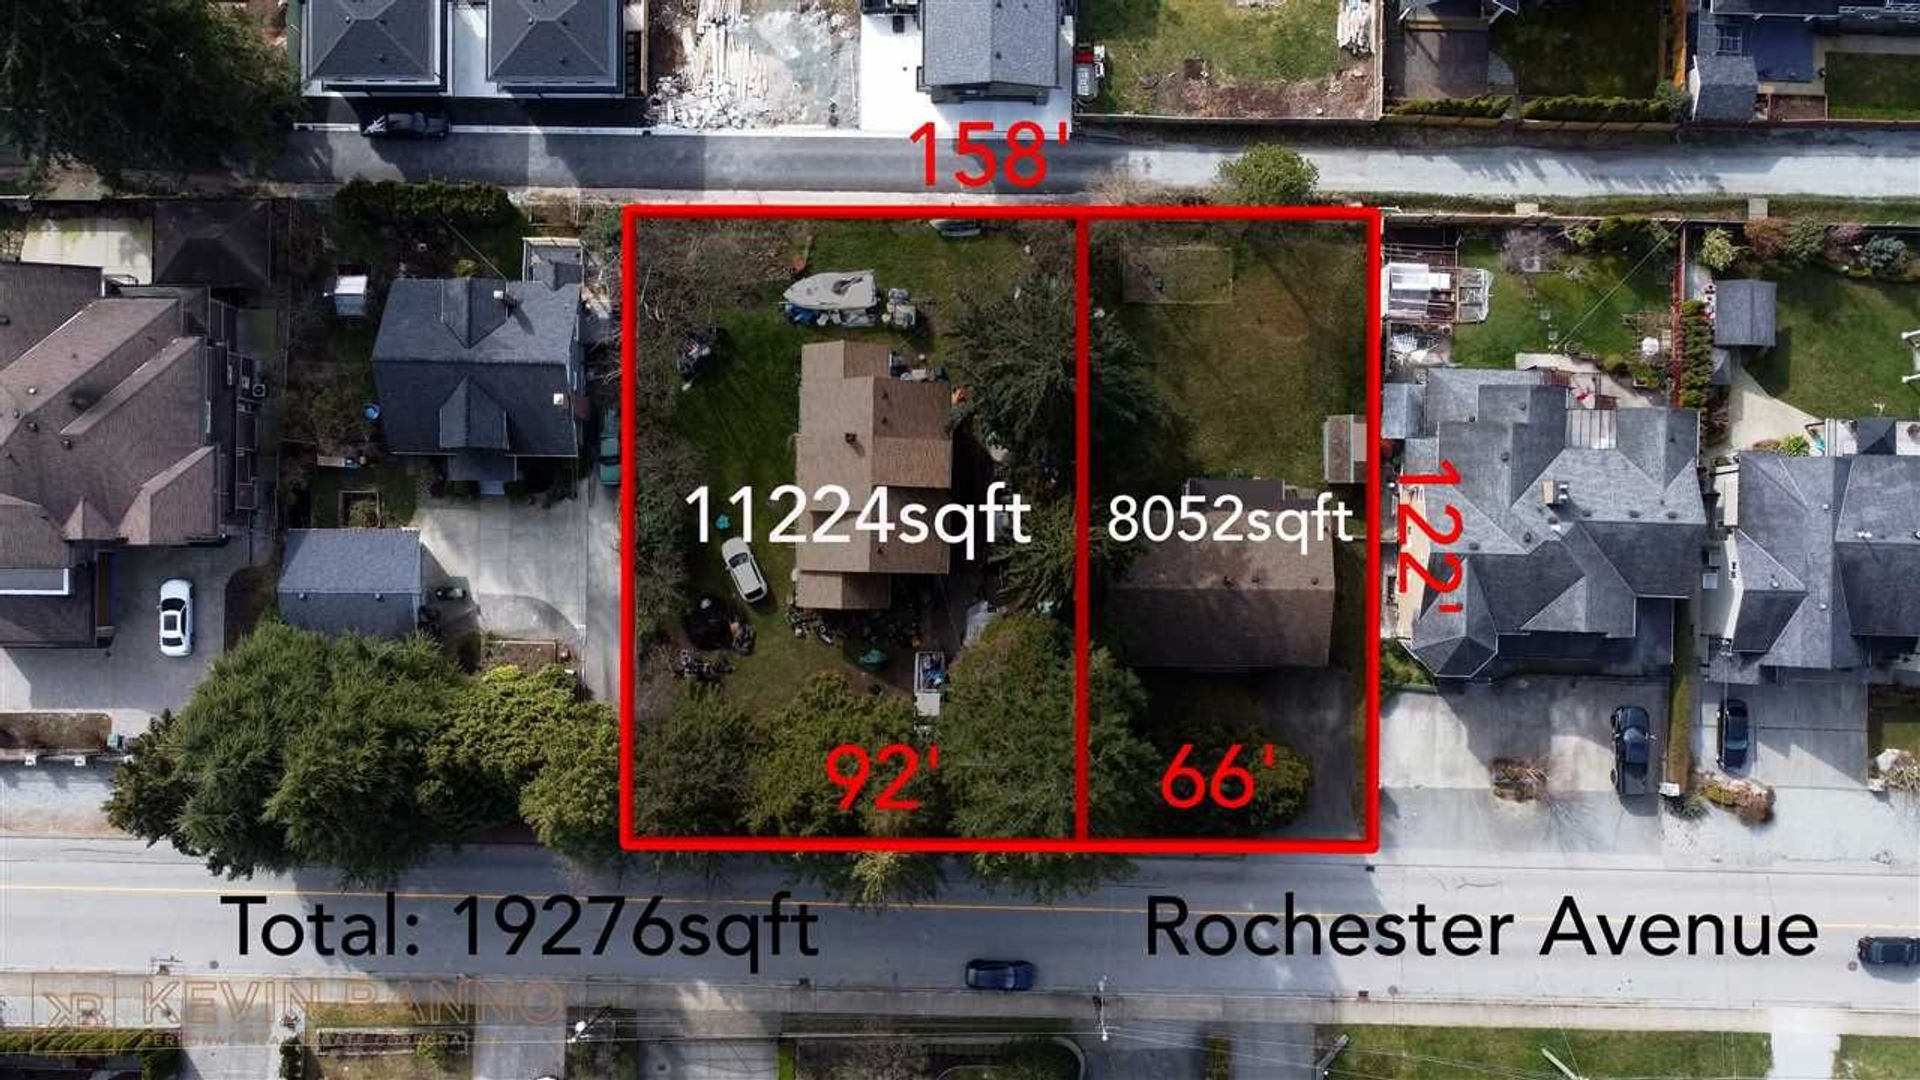 936-rochester-avenue-maillardville-coquitlam-01 at 936 Rochester Avenue, Maillardville, Coquitlam